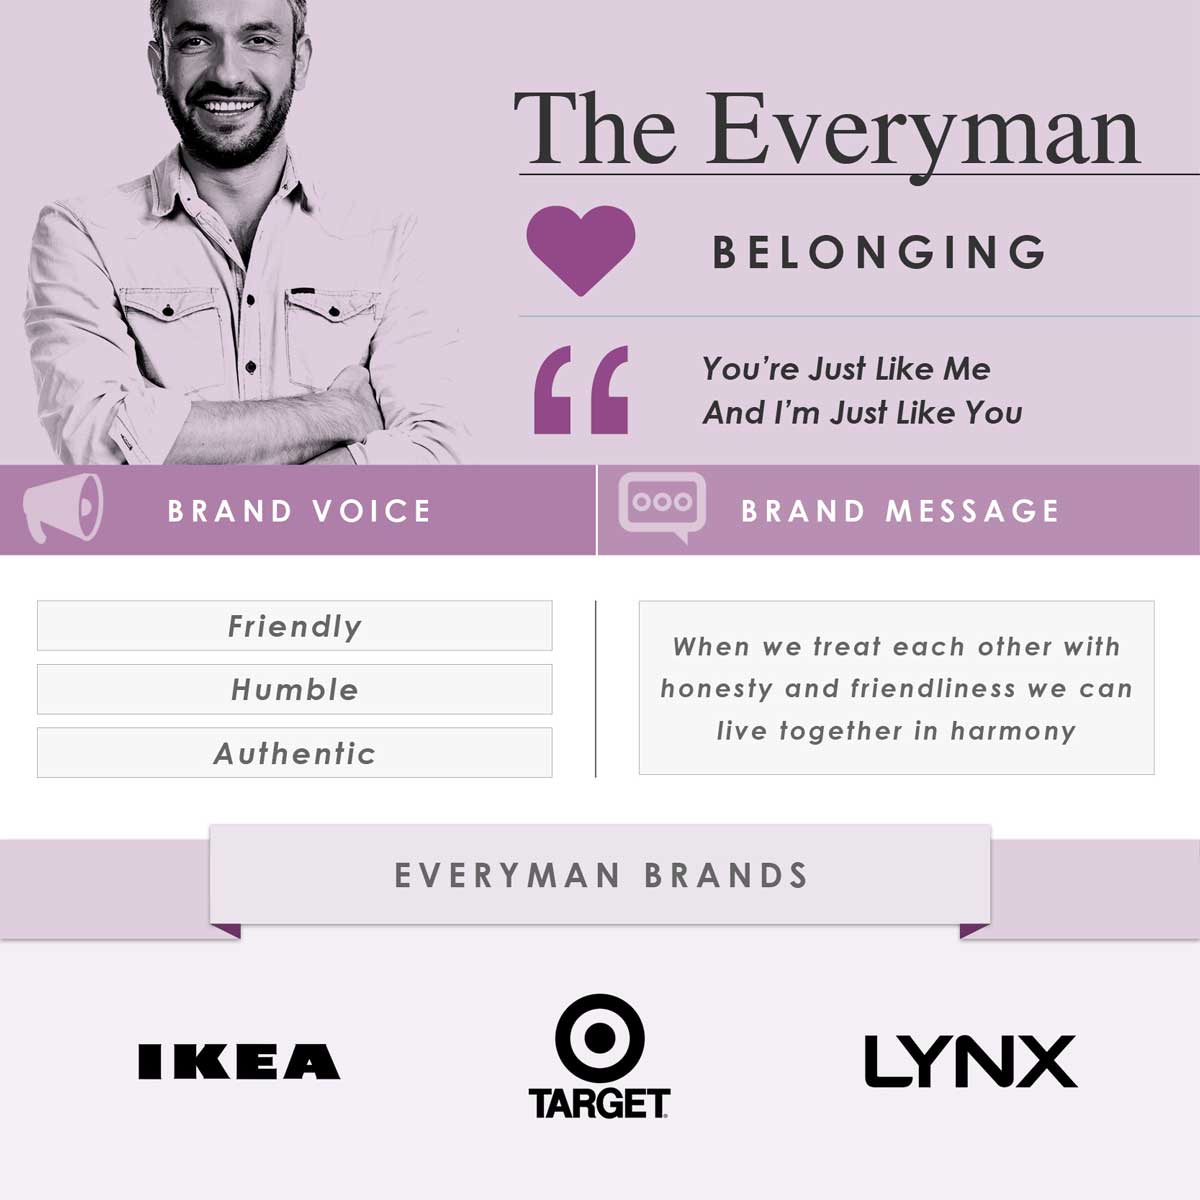 the everyman brand archetype